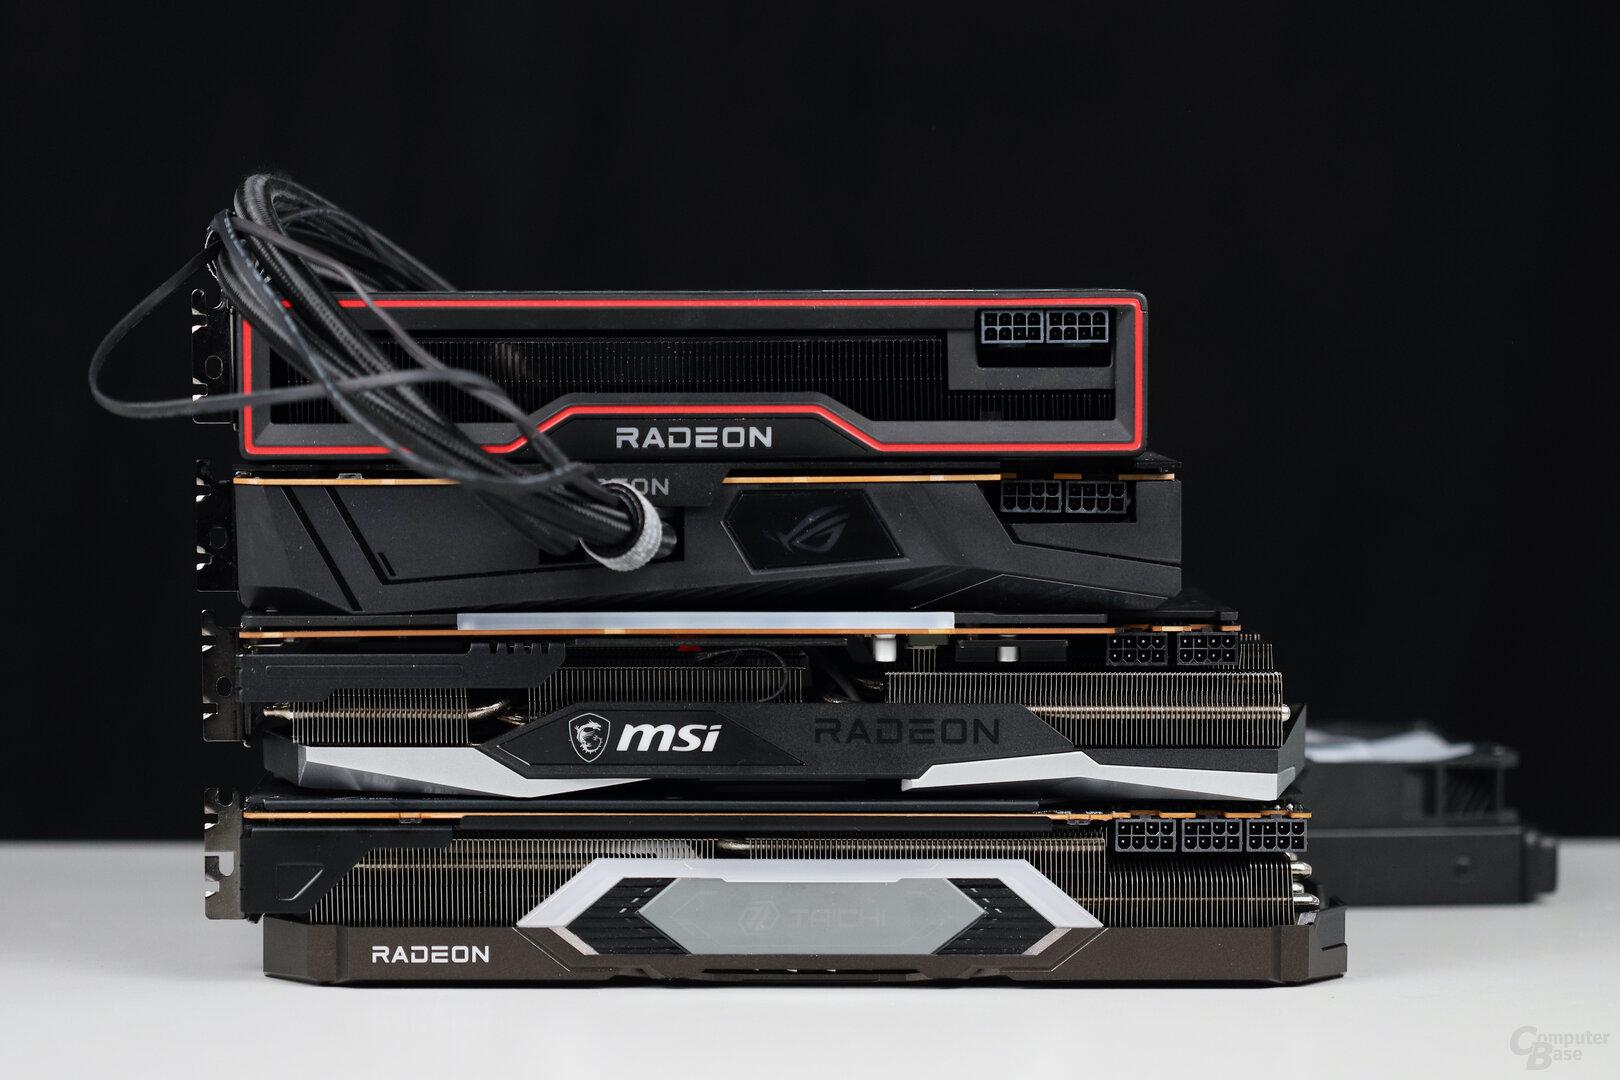 Asus Strix LC, ASRock Taichi und MSI Gaming X im Test